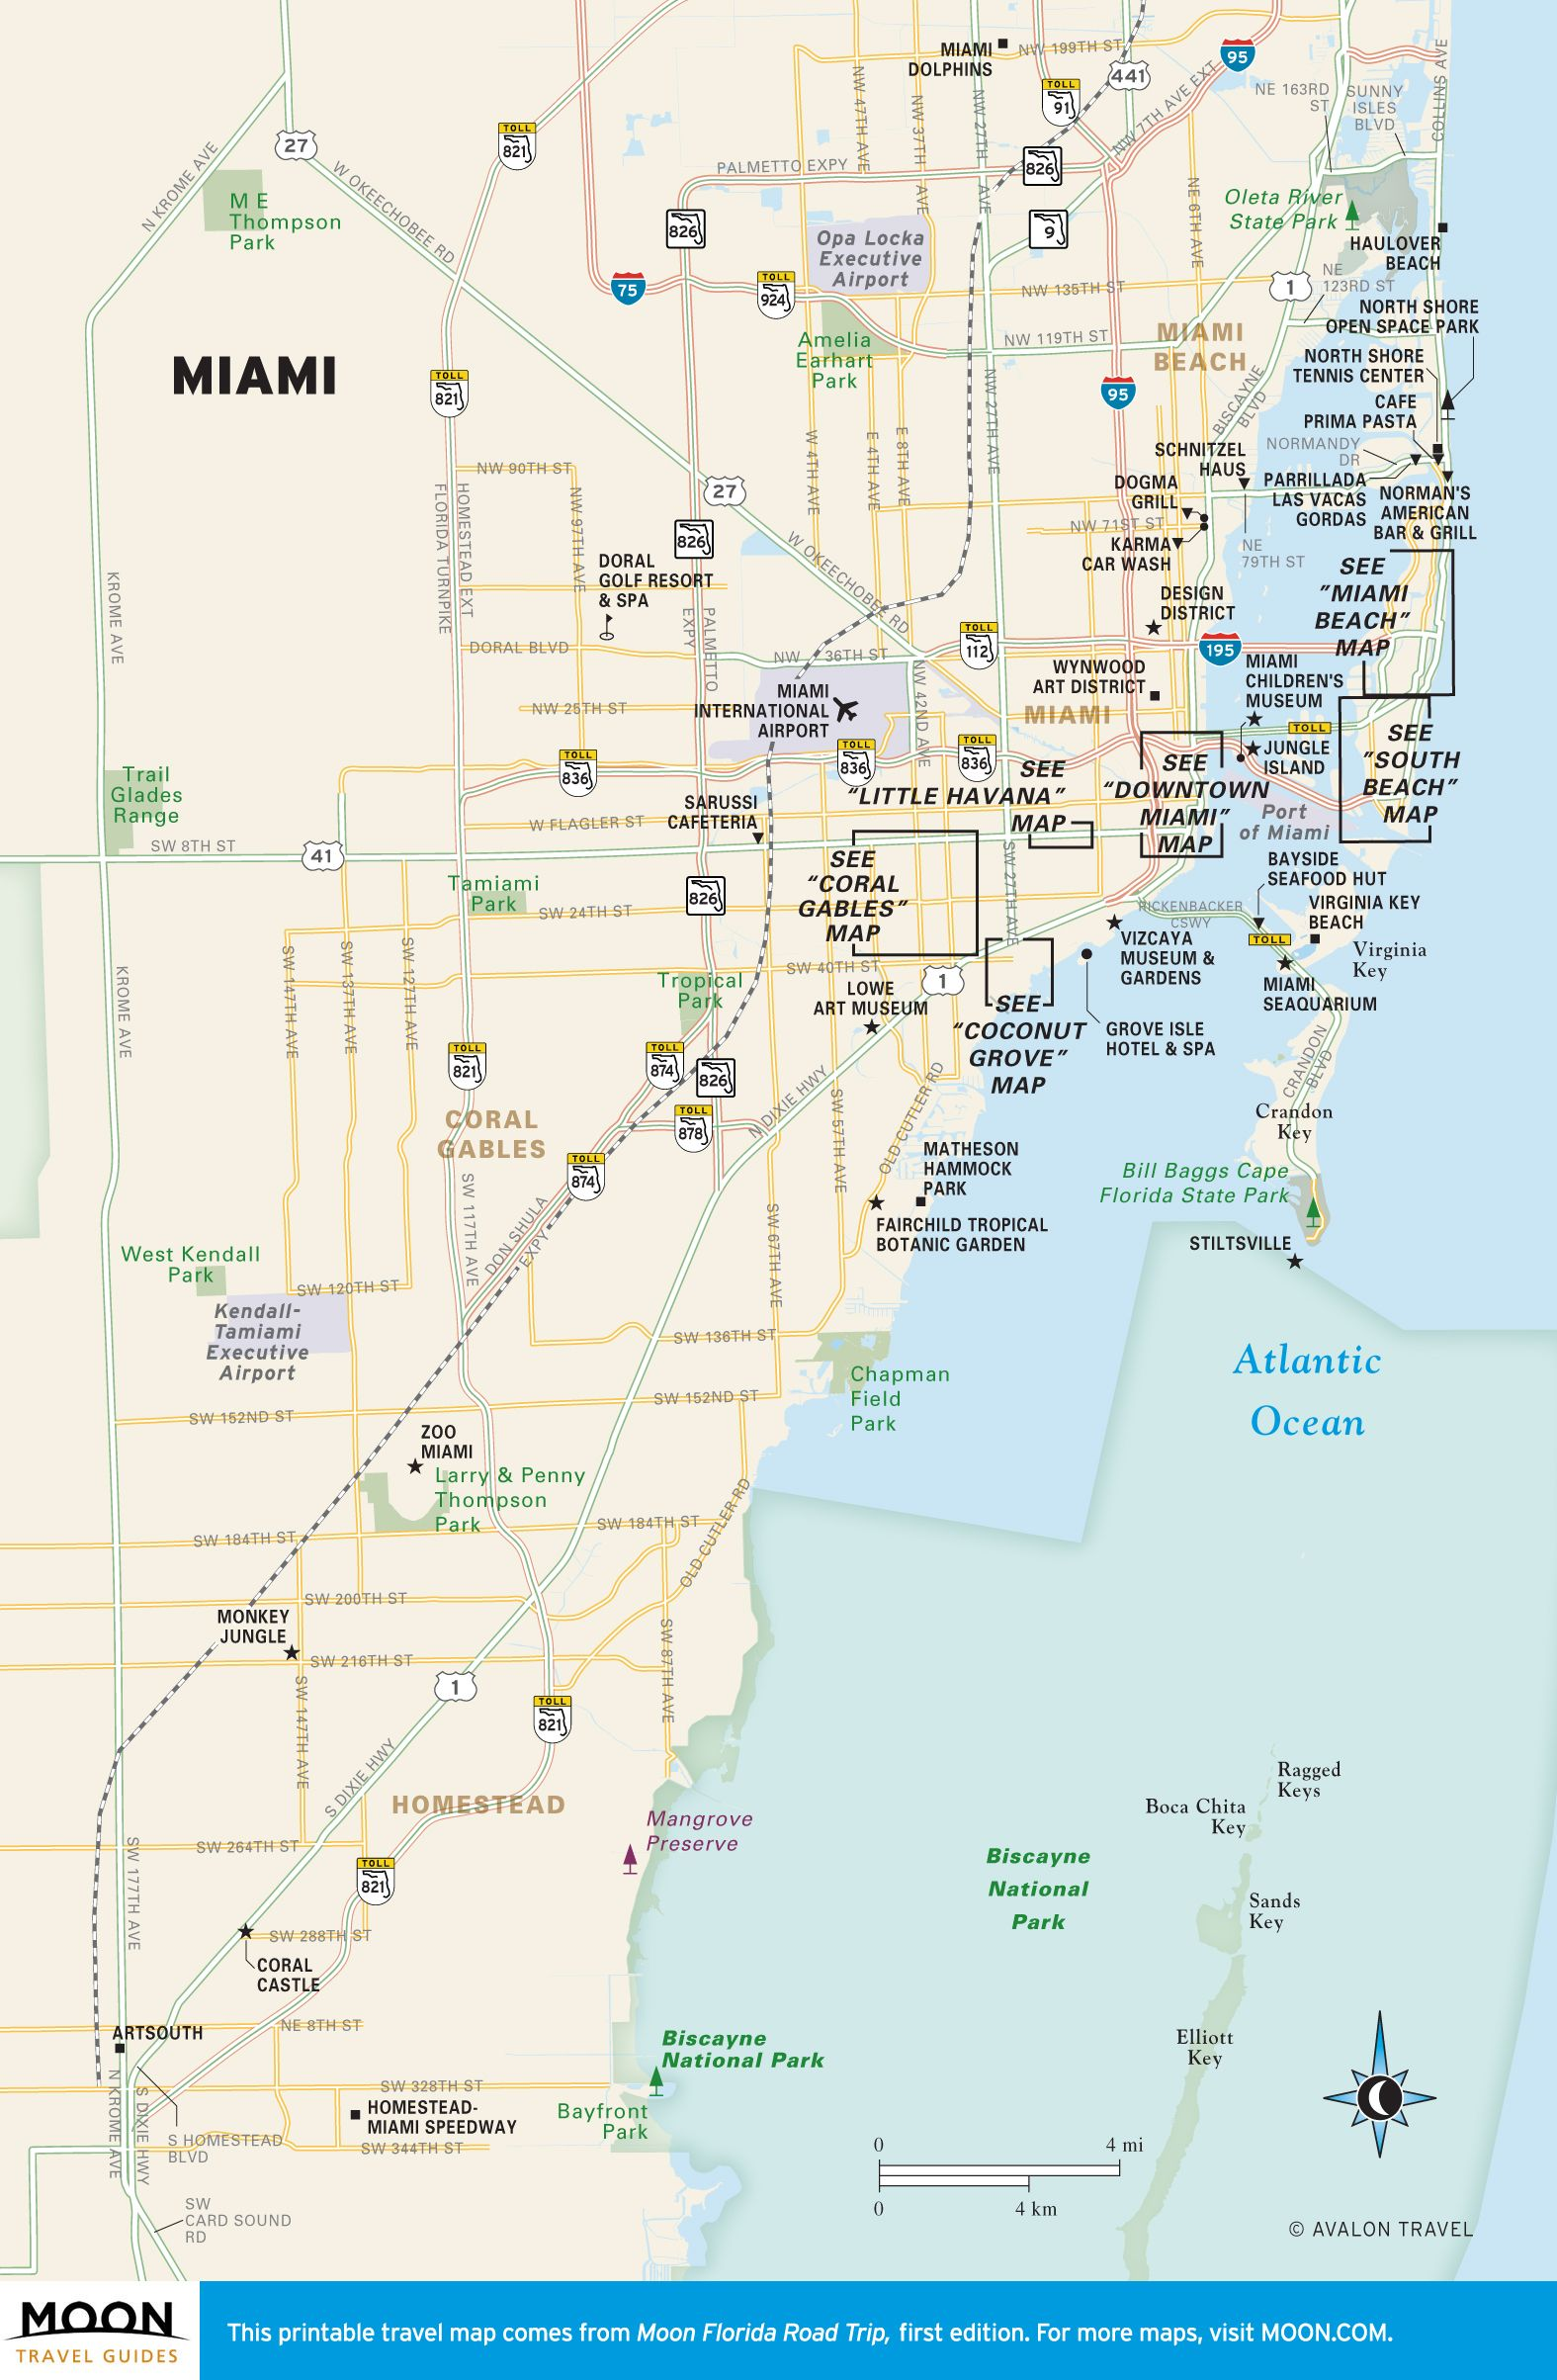 travel map of miami florida map of miami florida south florida everglades map [ 1575 x 2407 Pixel ]